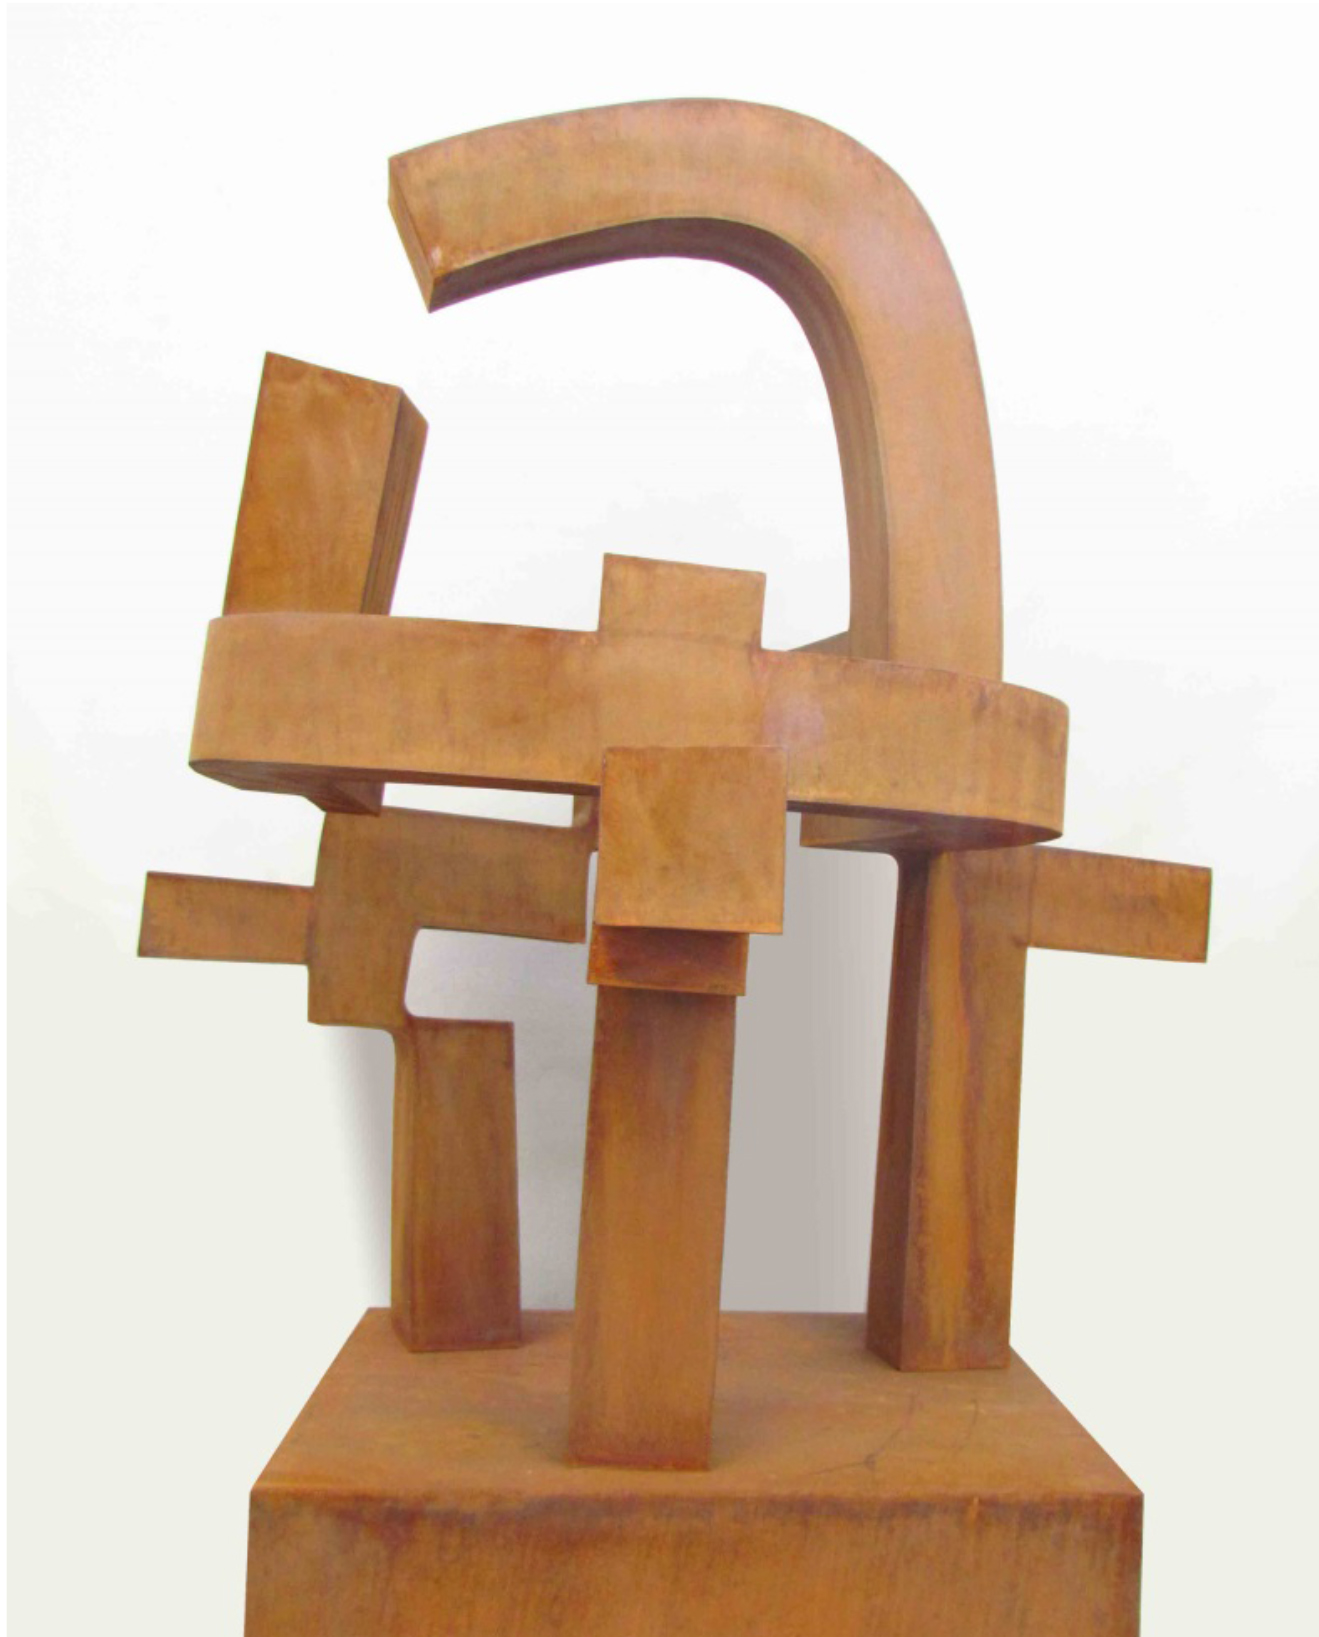 <strong> Carlos Albert</strong> Pozo, 163 x 102 x 91cm Acero Corten, Pieza Única Año 2015